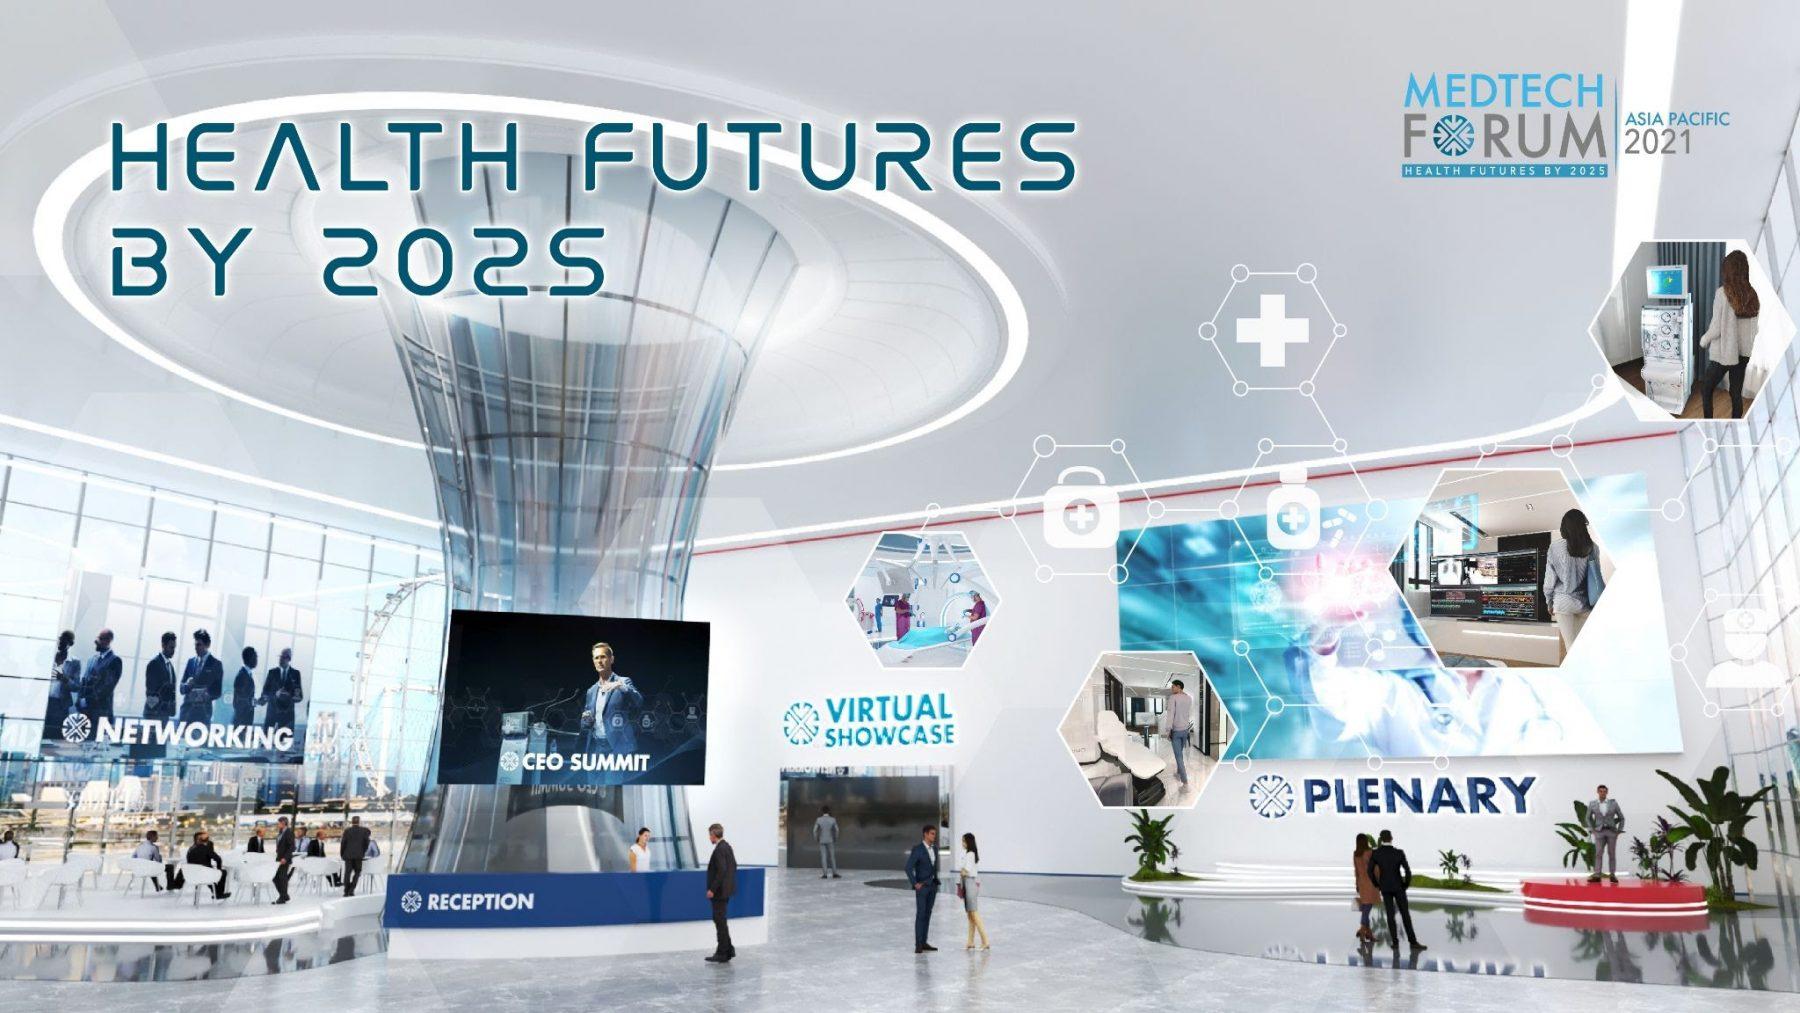 Asia Pacific MedTech Forum 2021: 19 & 20 Οκτωβρίου 2021 στην Σιγκαπούρη